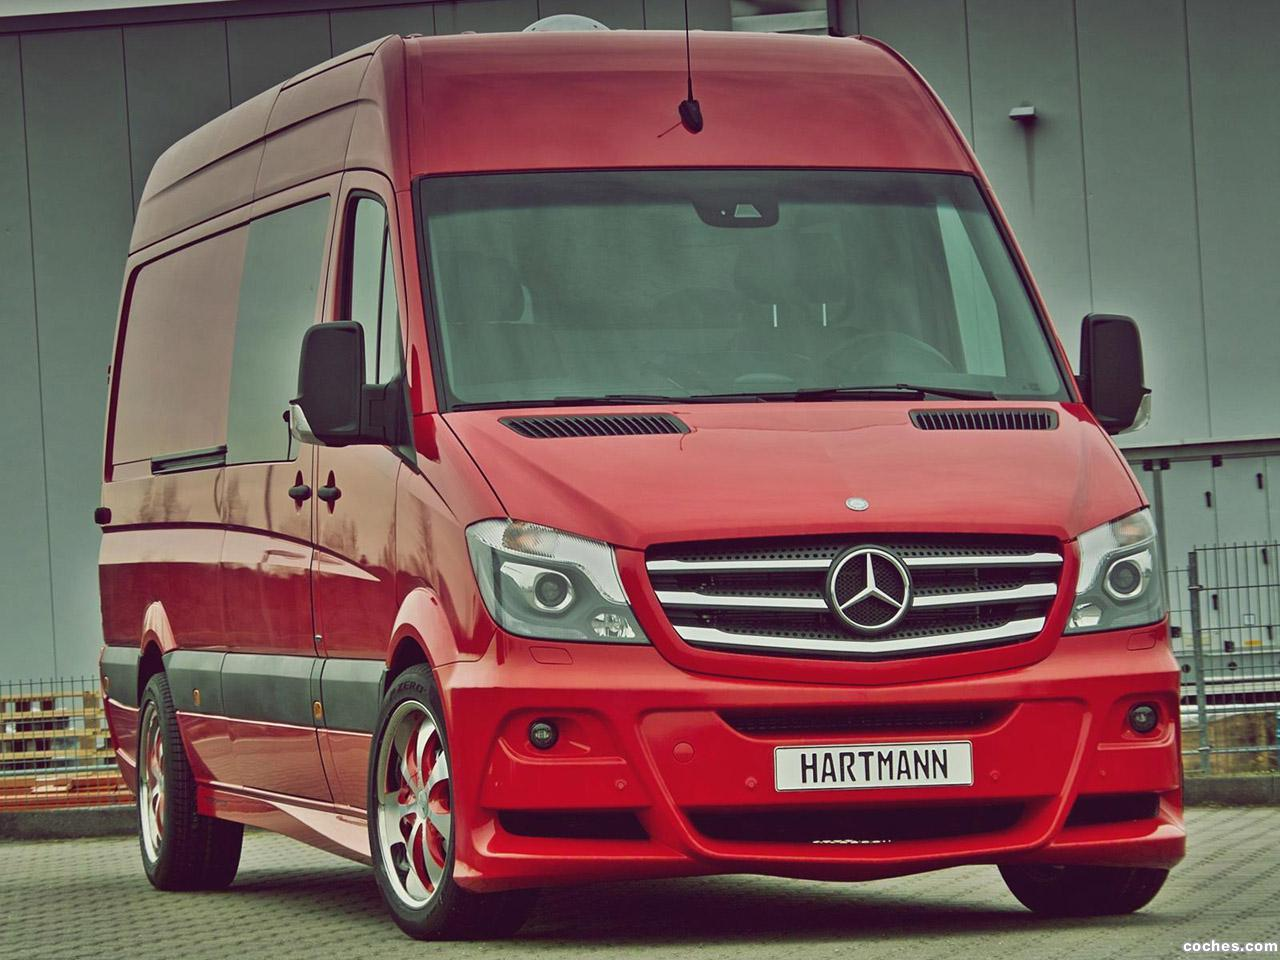 Foto 1 de Hartmann Mercedes Sprinter 319 CDI 2014